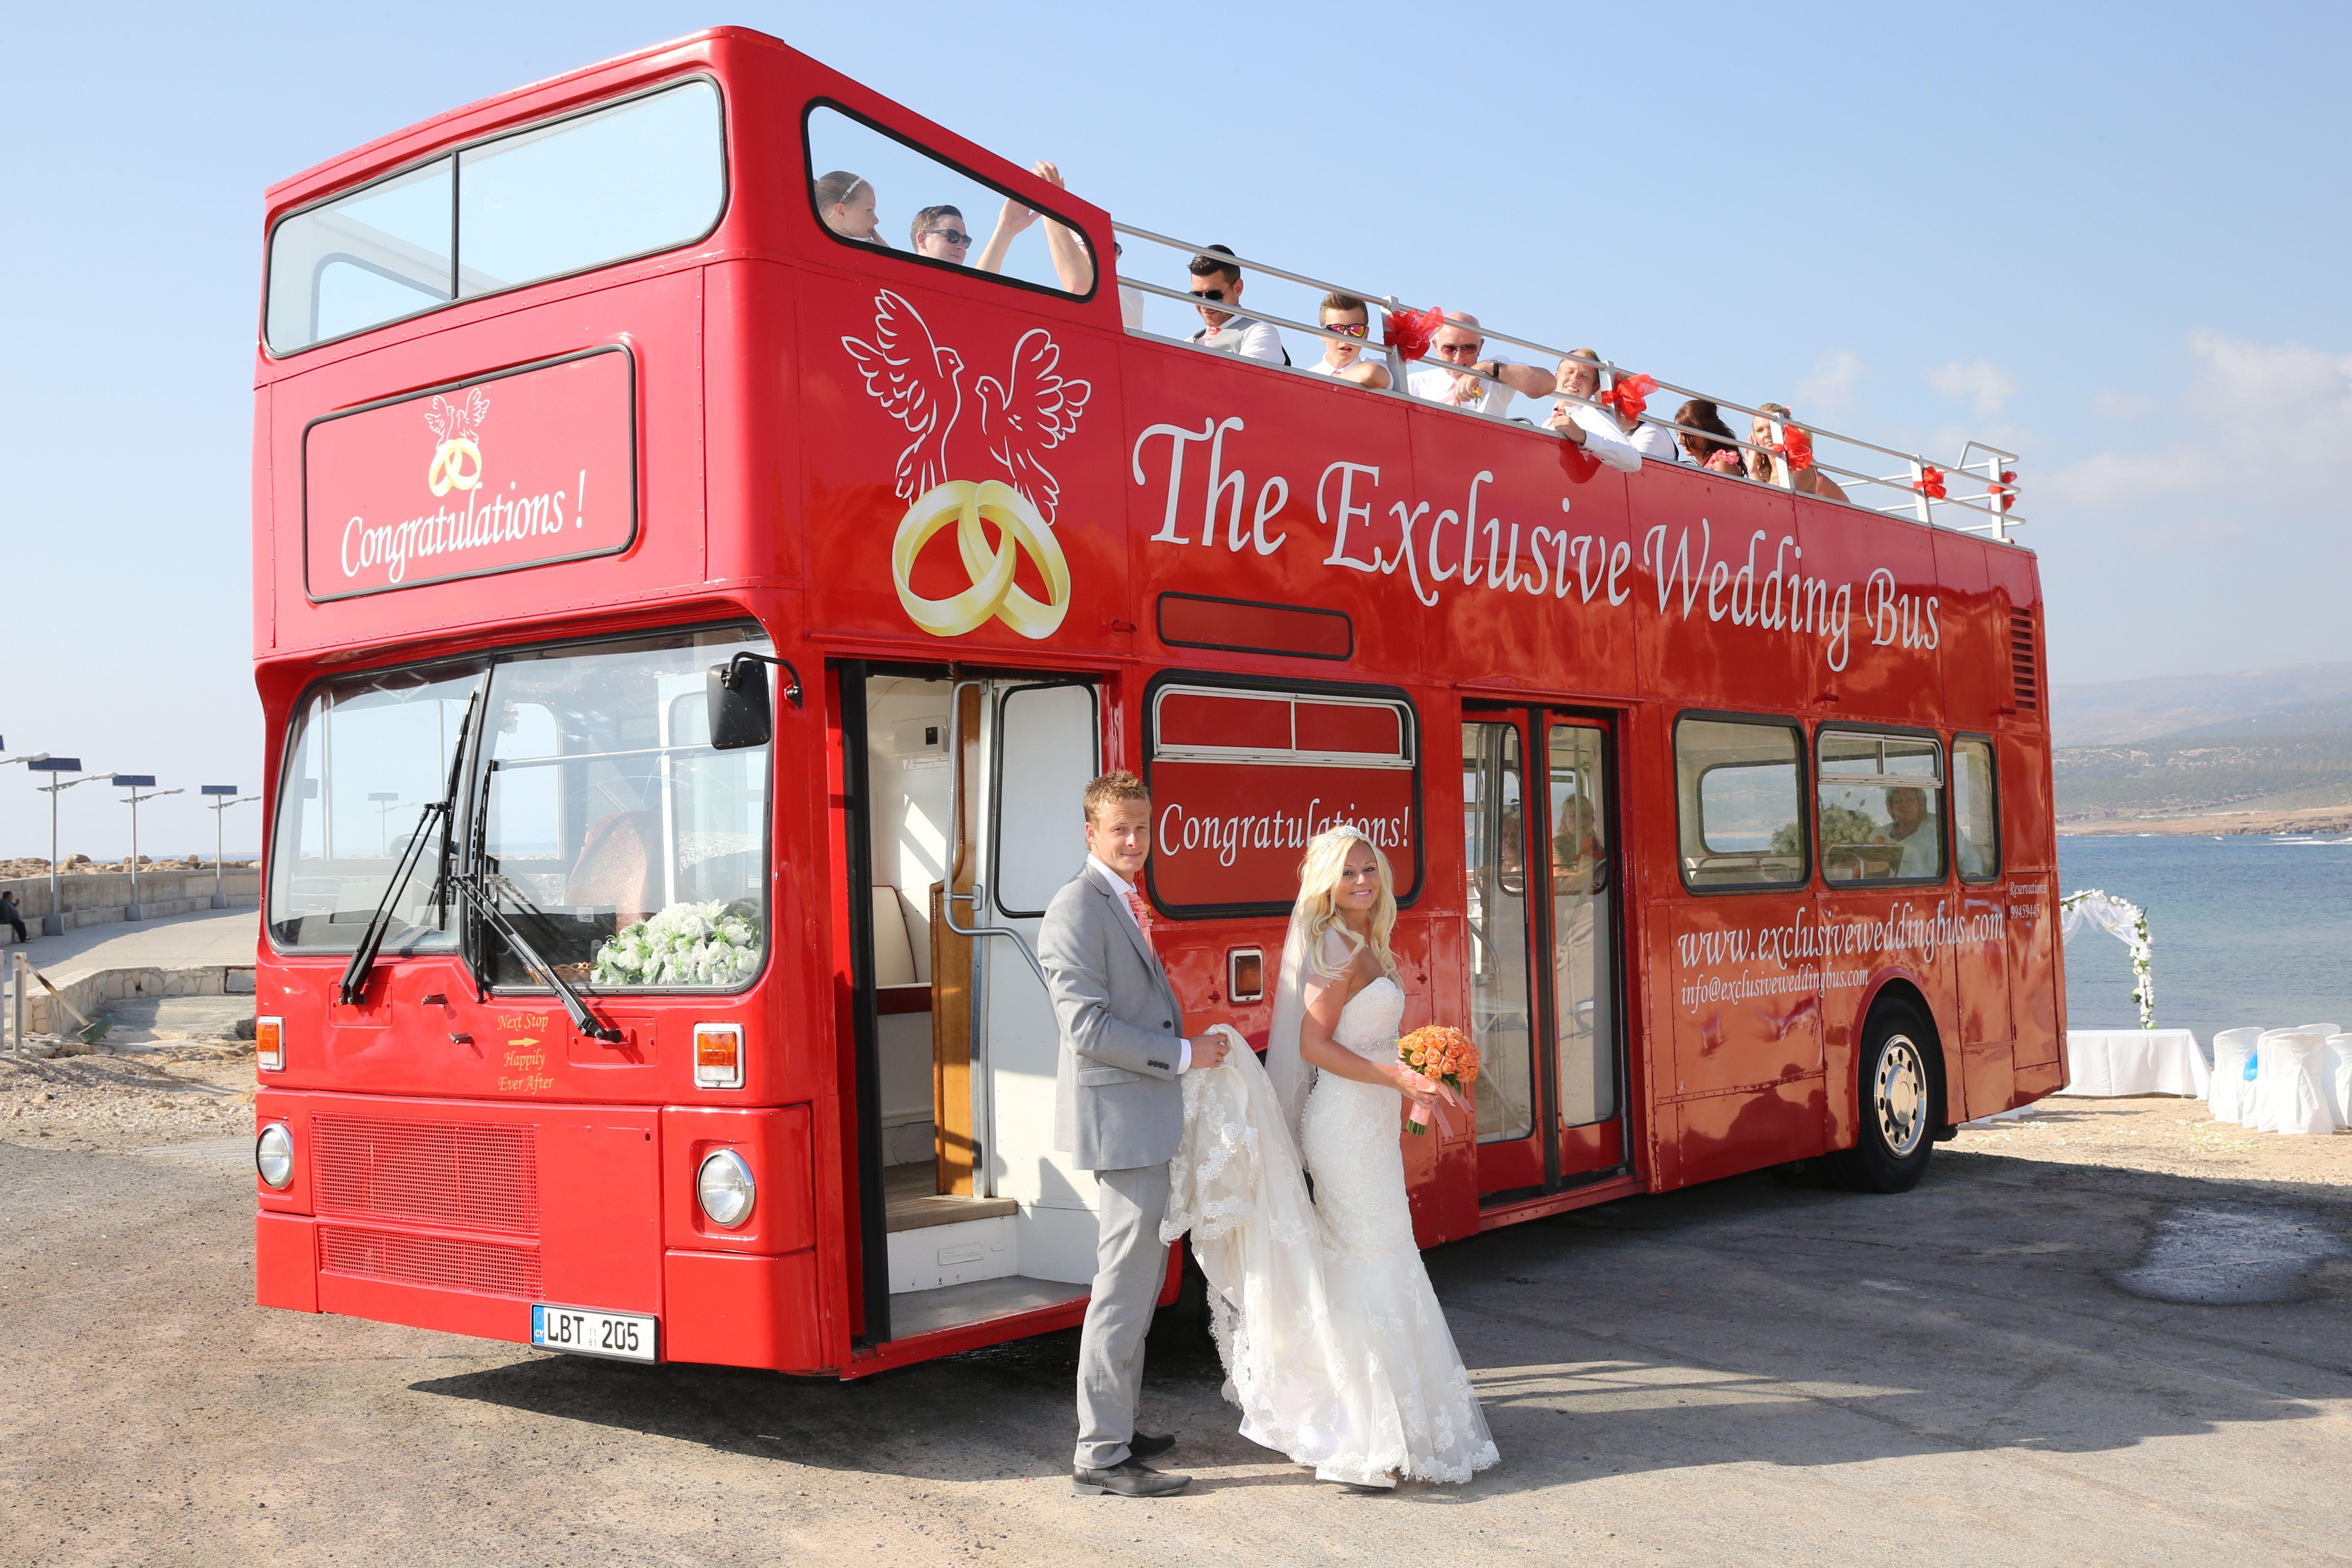 London Red Bus Weddings Exclusives Paphos Cyprus Red Bus Bus Paphos